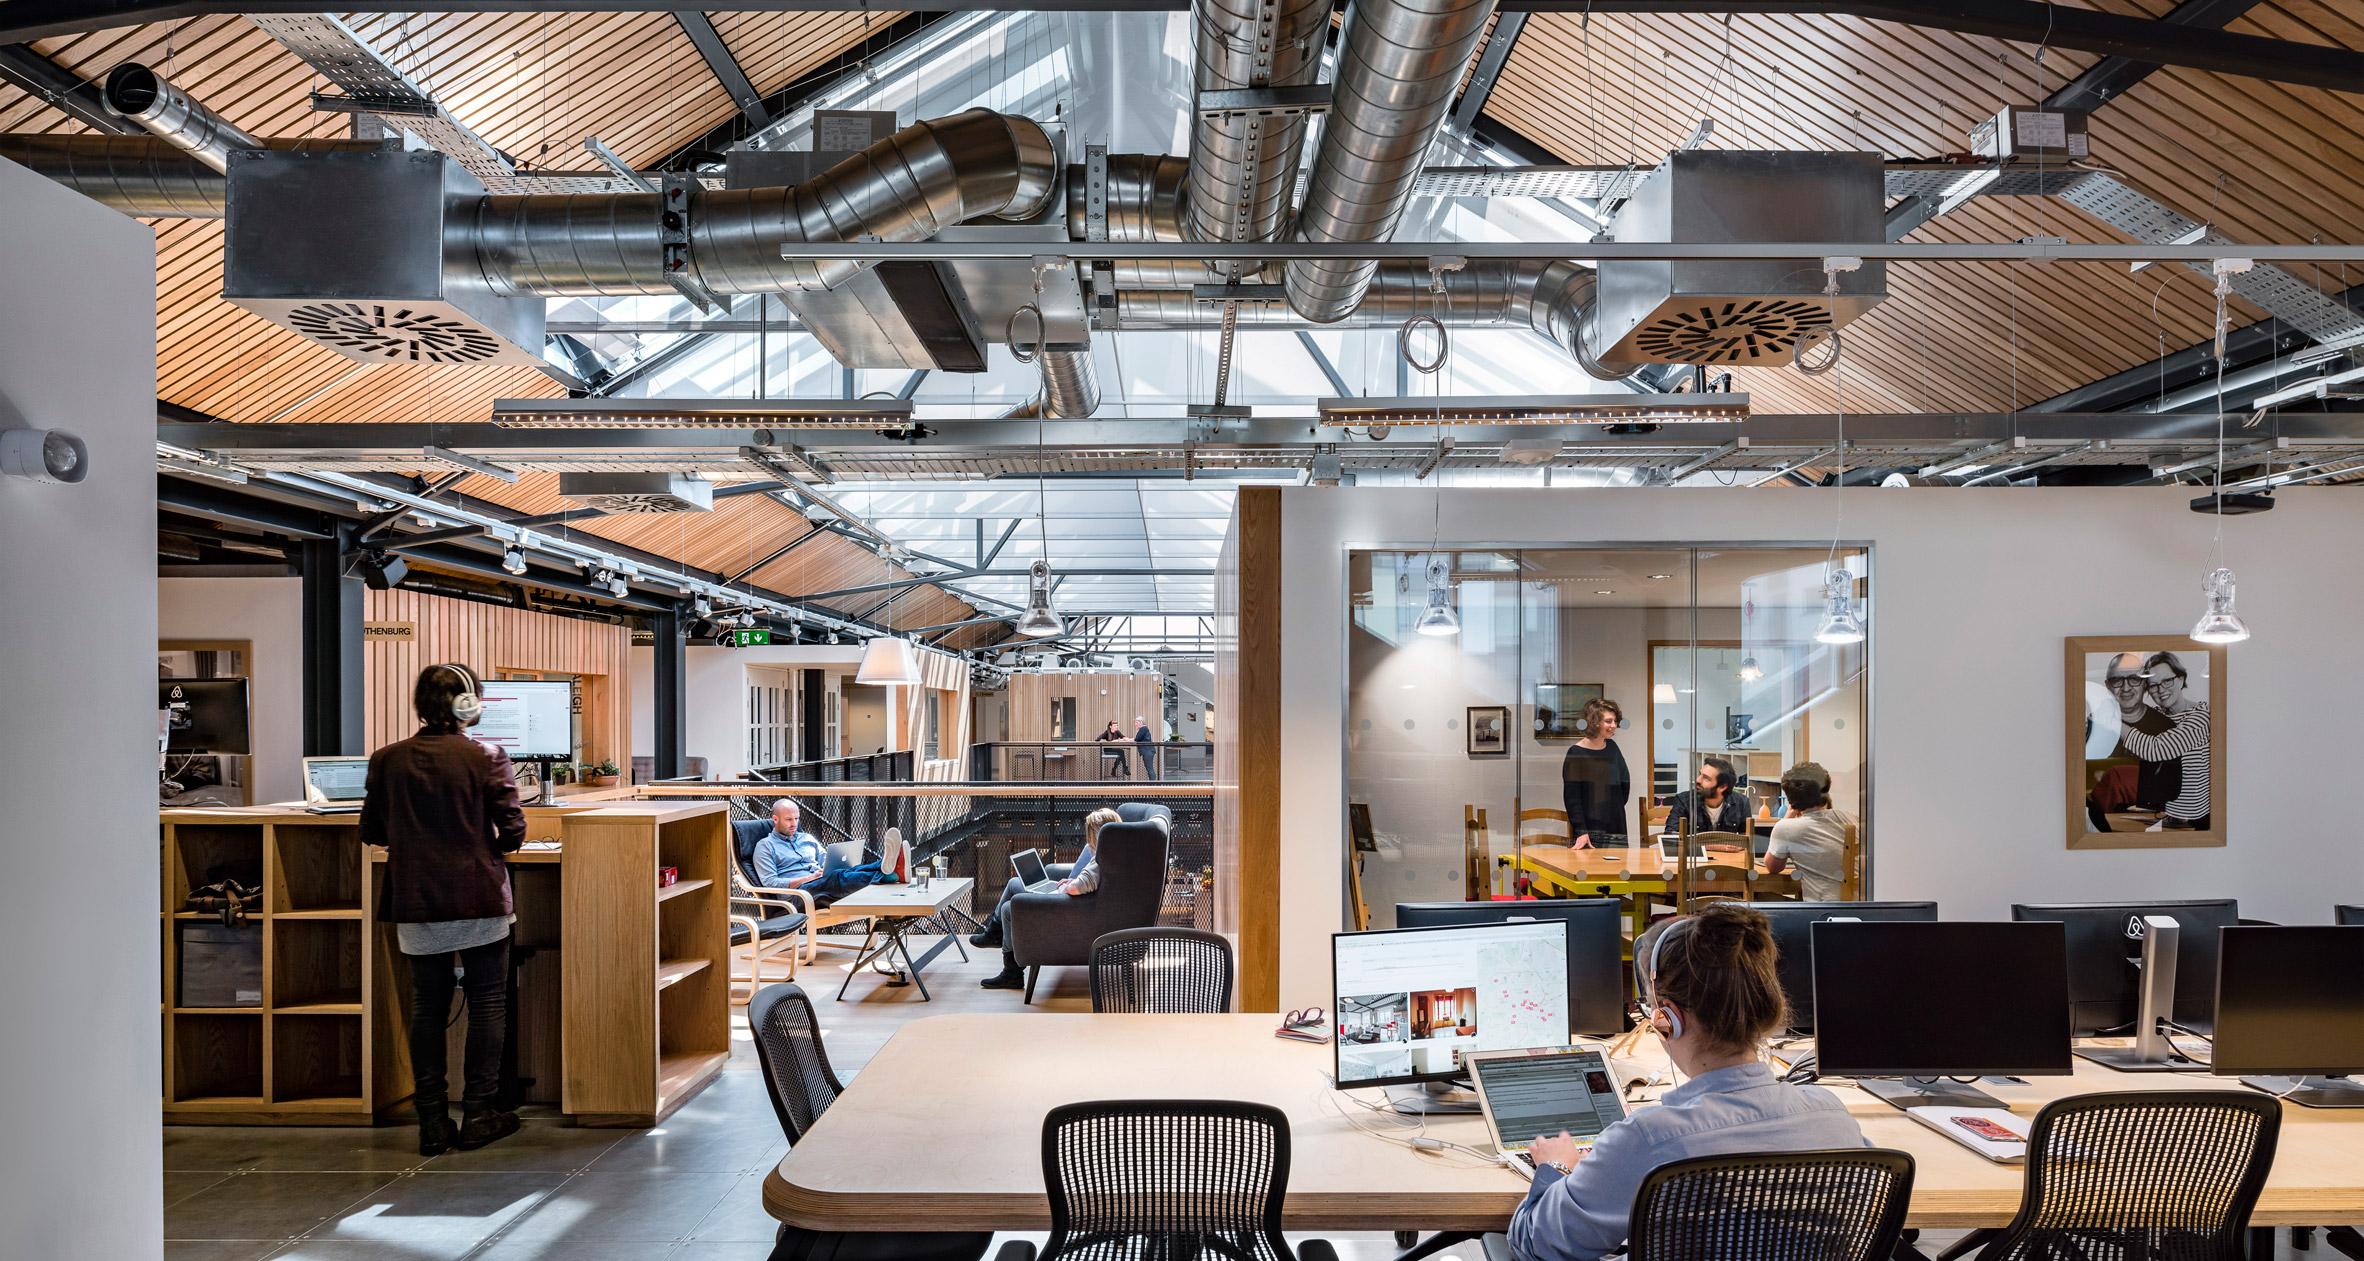 airbnb-dublin-office-interiors-ireland-offices_dezeen_2364_col_8